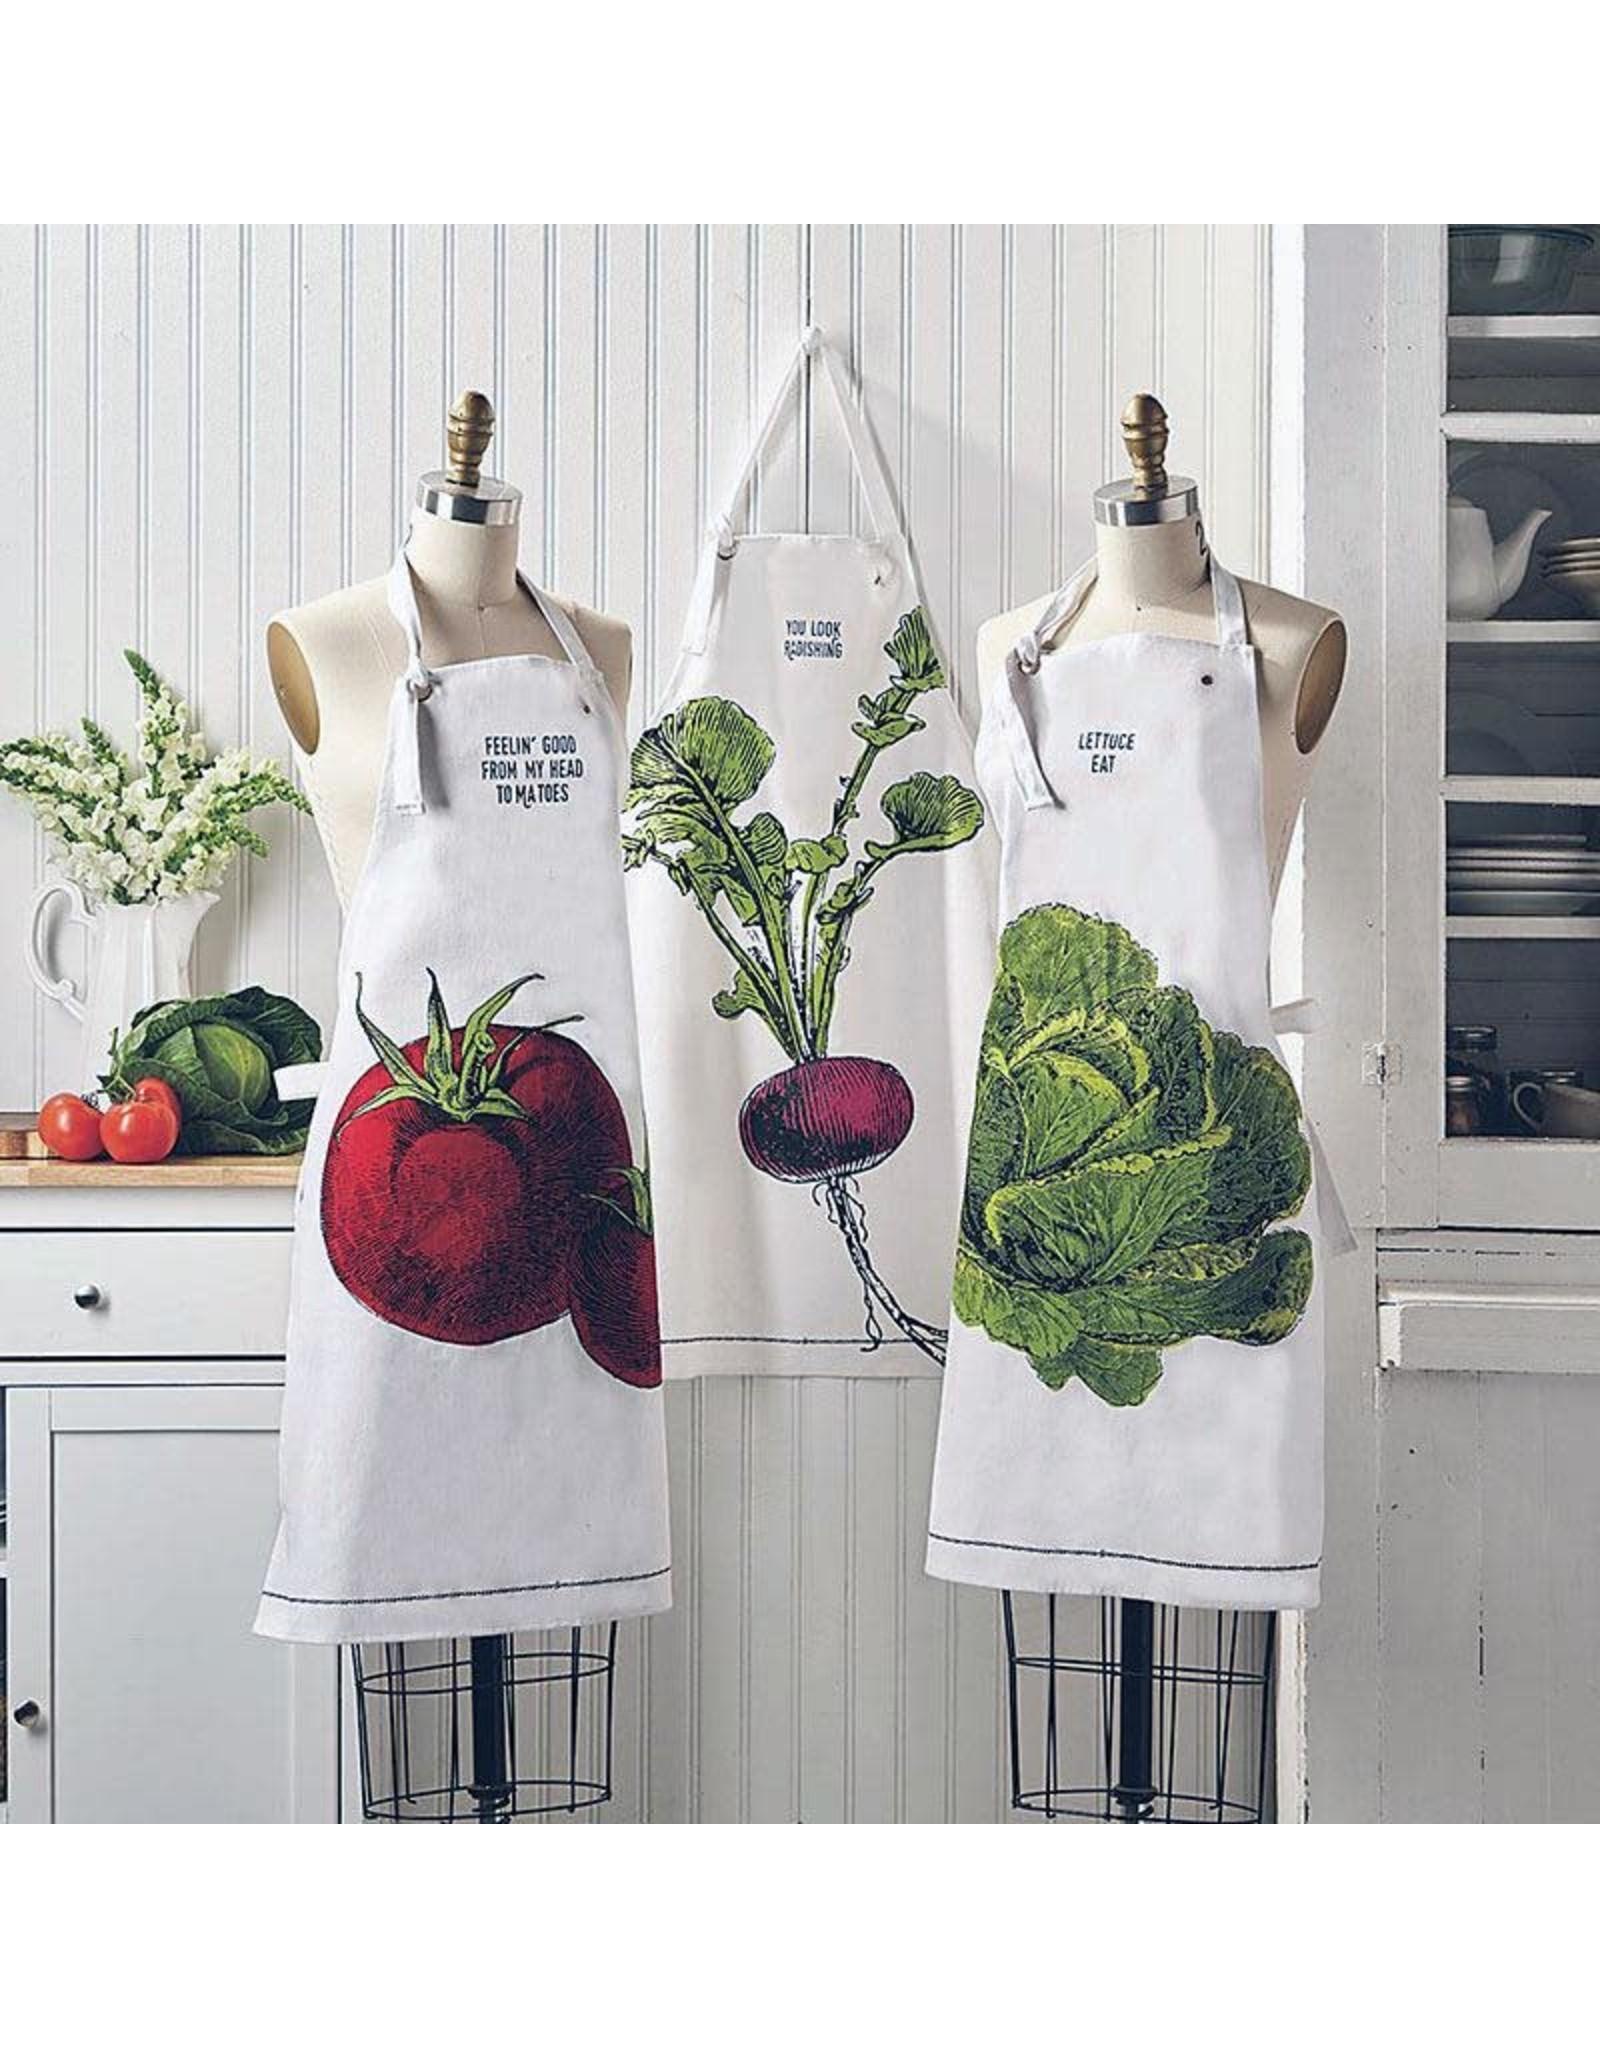 "Moda Home Farm to Table, Apron in a Mason Jar ""Feelin' Good From My Head Tomatoes"""